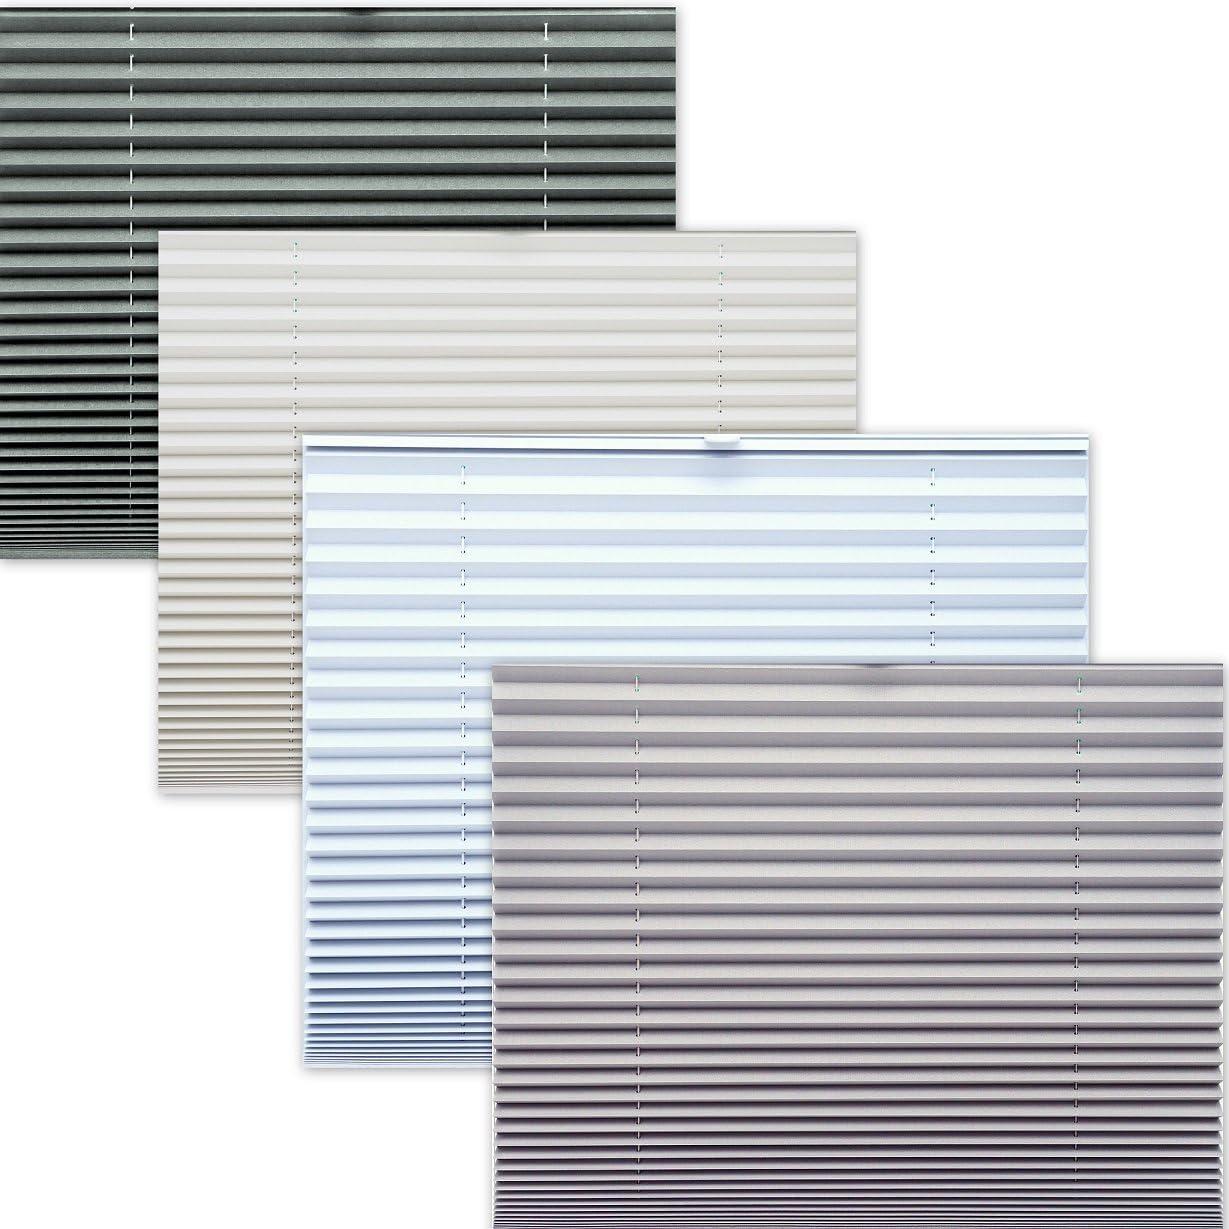 MEGA AUSWAHL 80 GR/Ö/ßEN im SHOP THERMO BLACK OUT PLISSEE 40x150 cm FALTROLLO WEISS SILBER 100/% VERDUNKELND